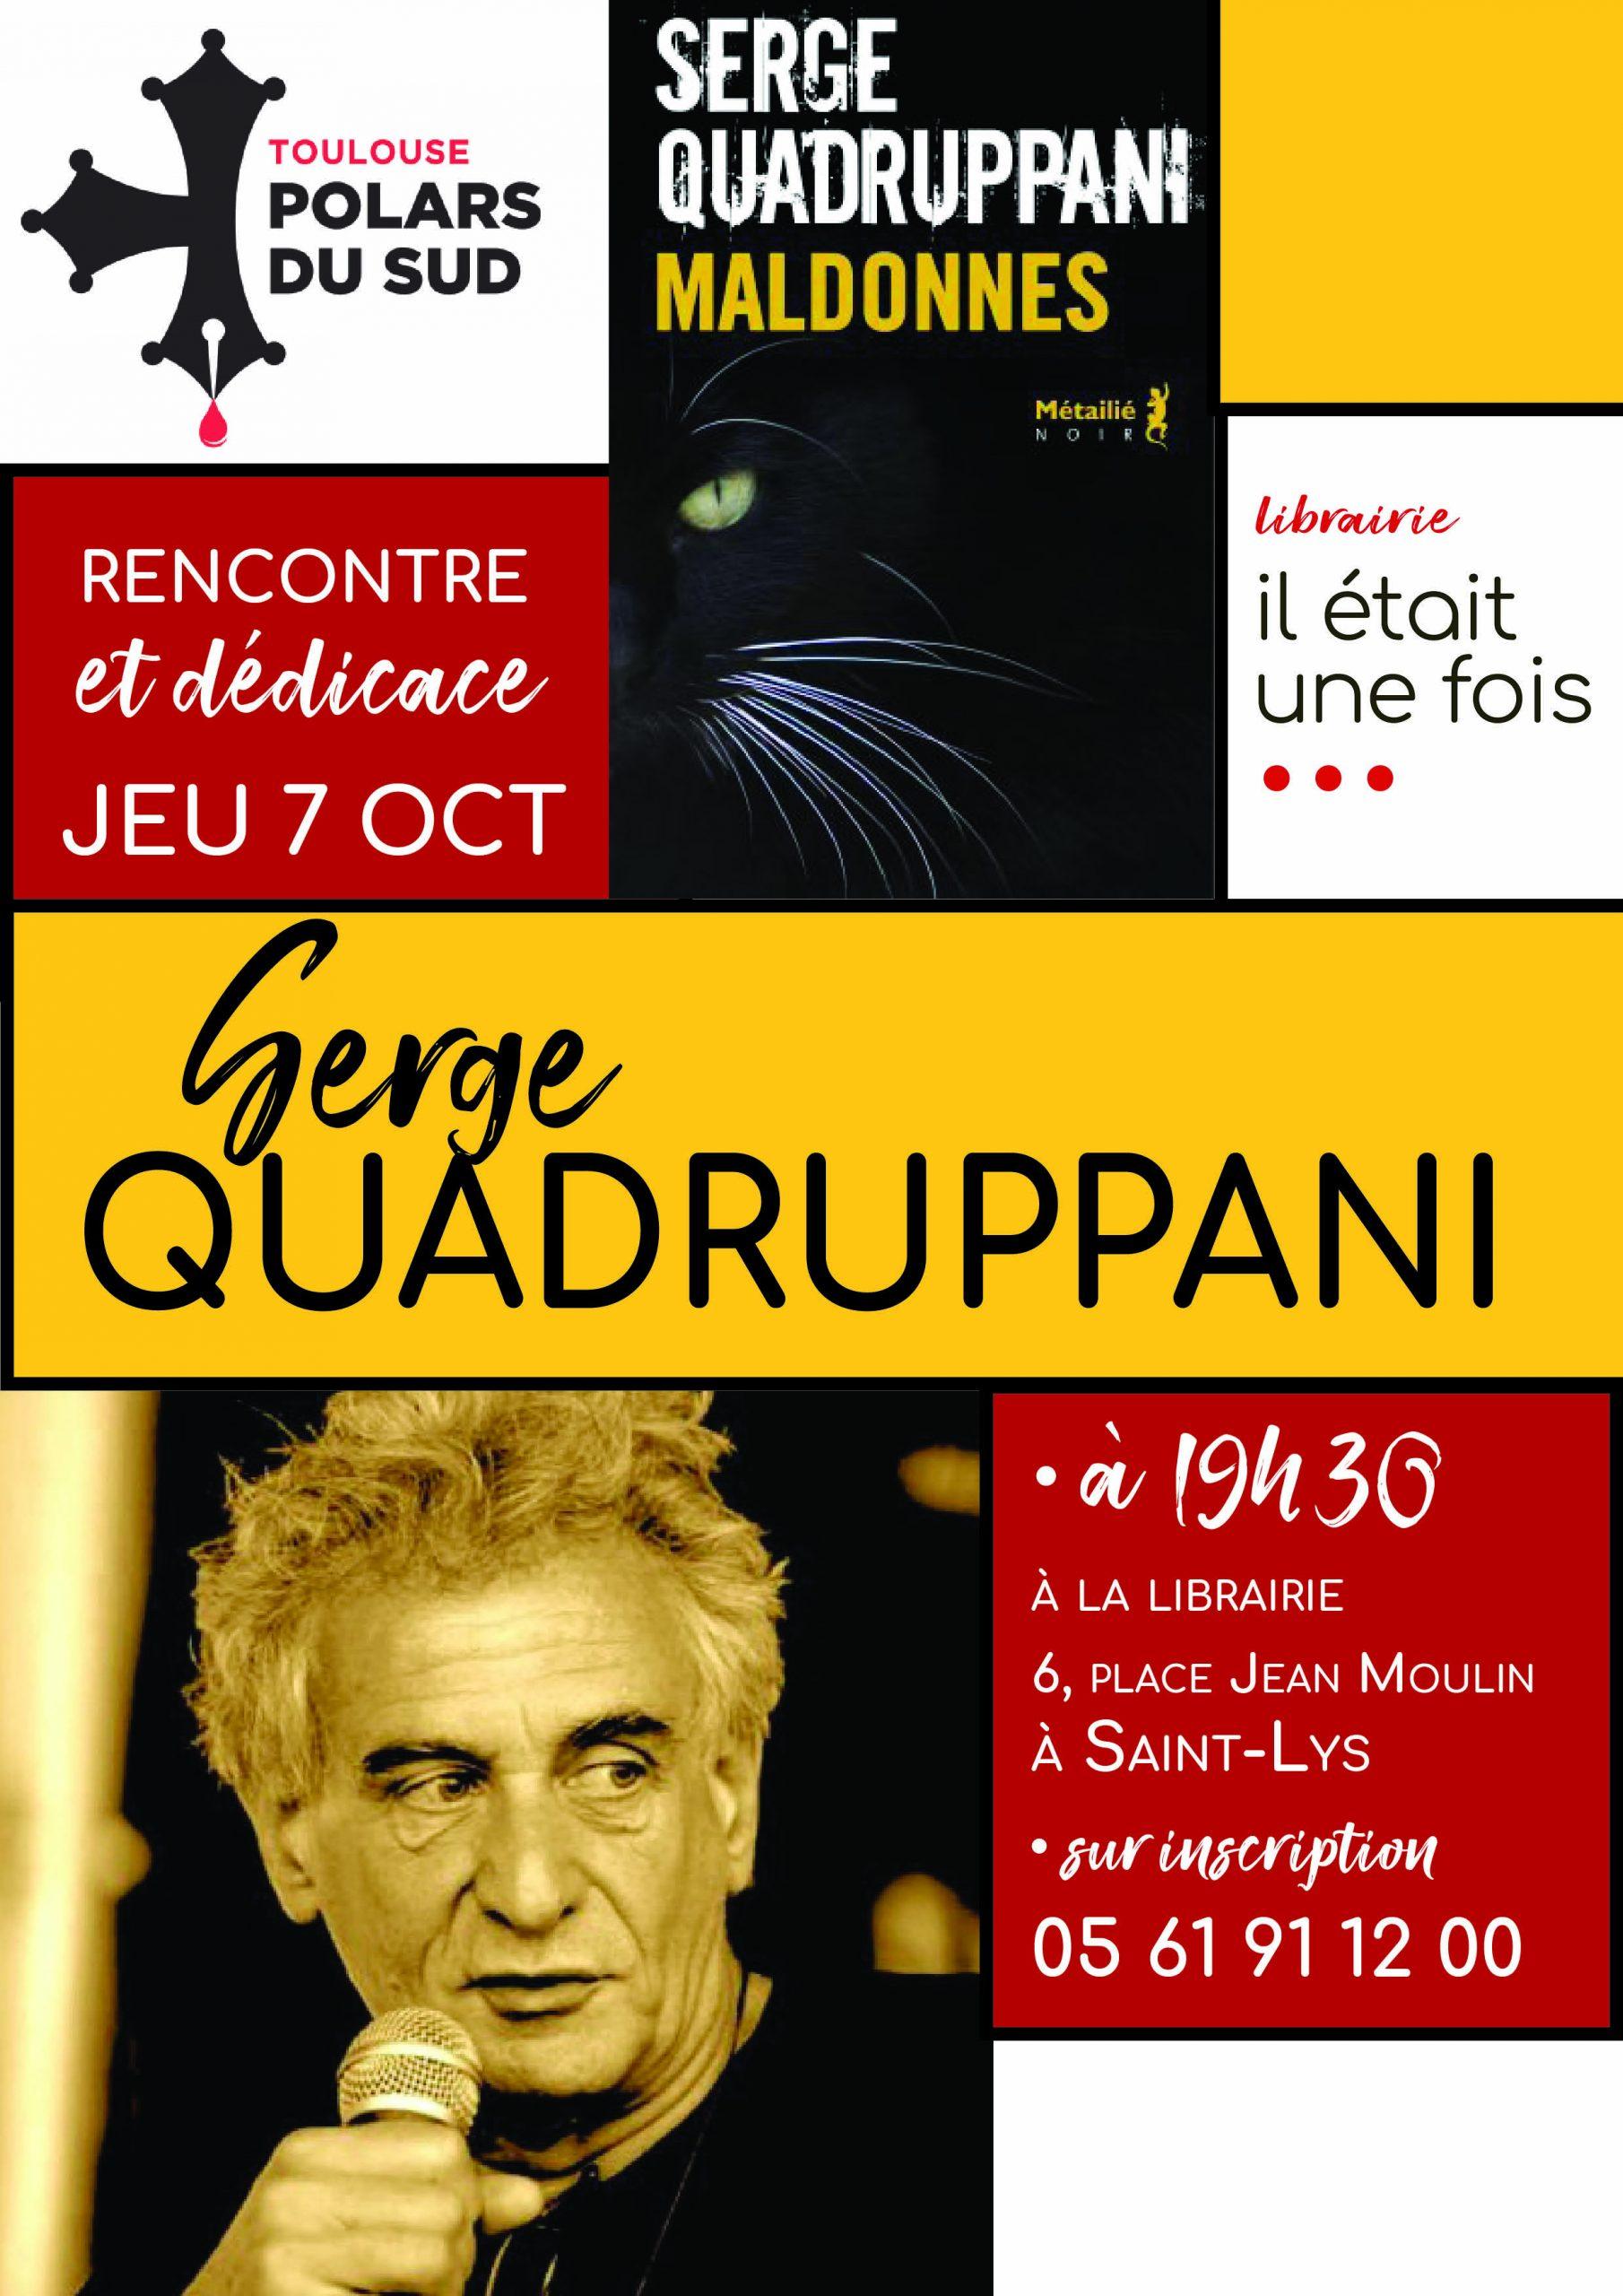 Serge Quadruppani